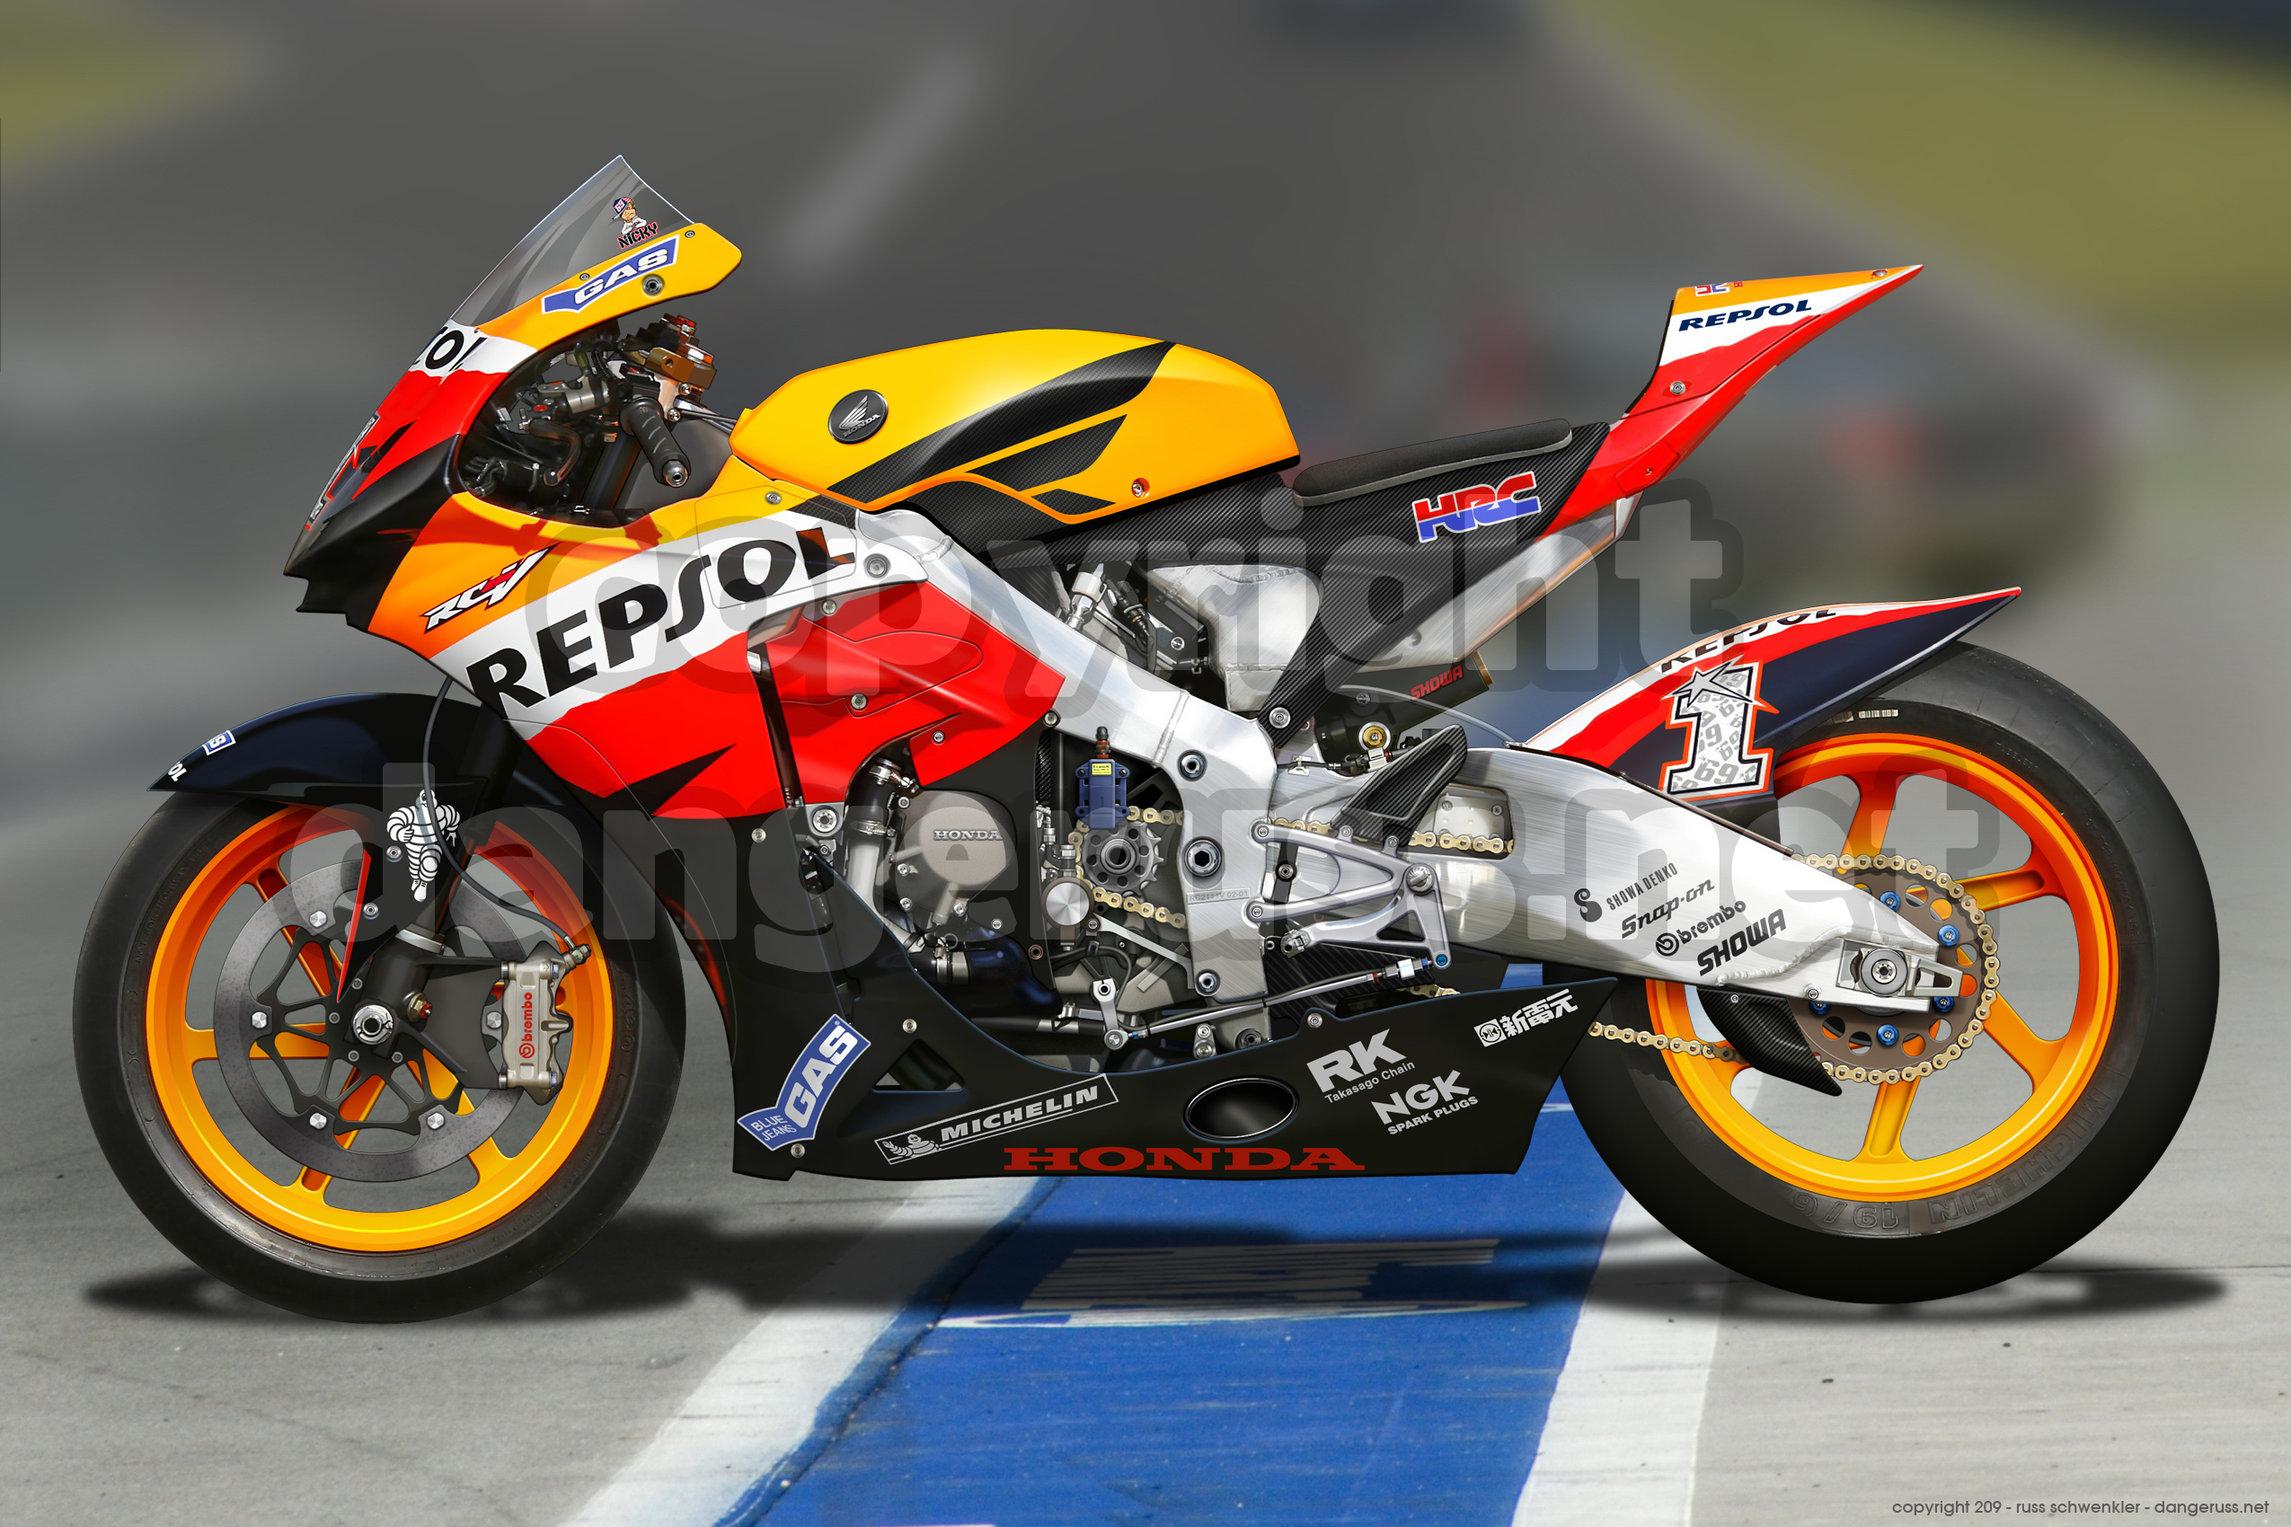 Honda MotoGP by dangeruss 2291x1527